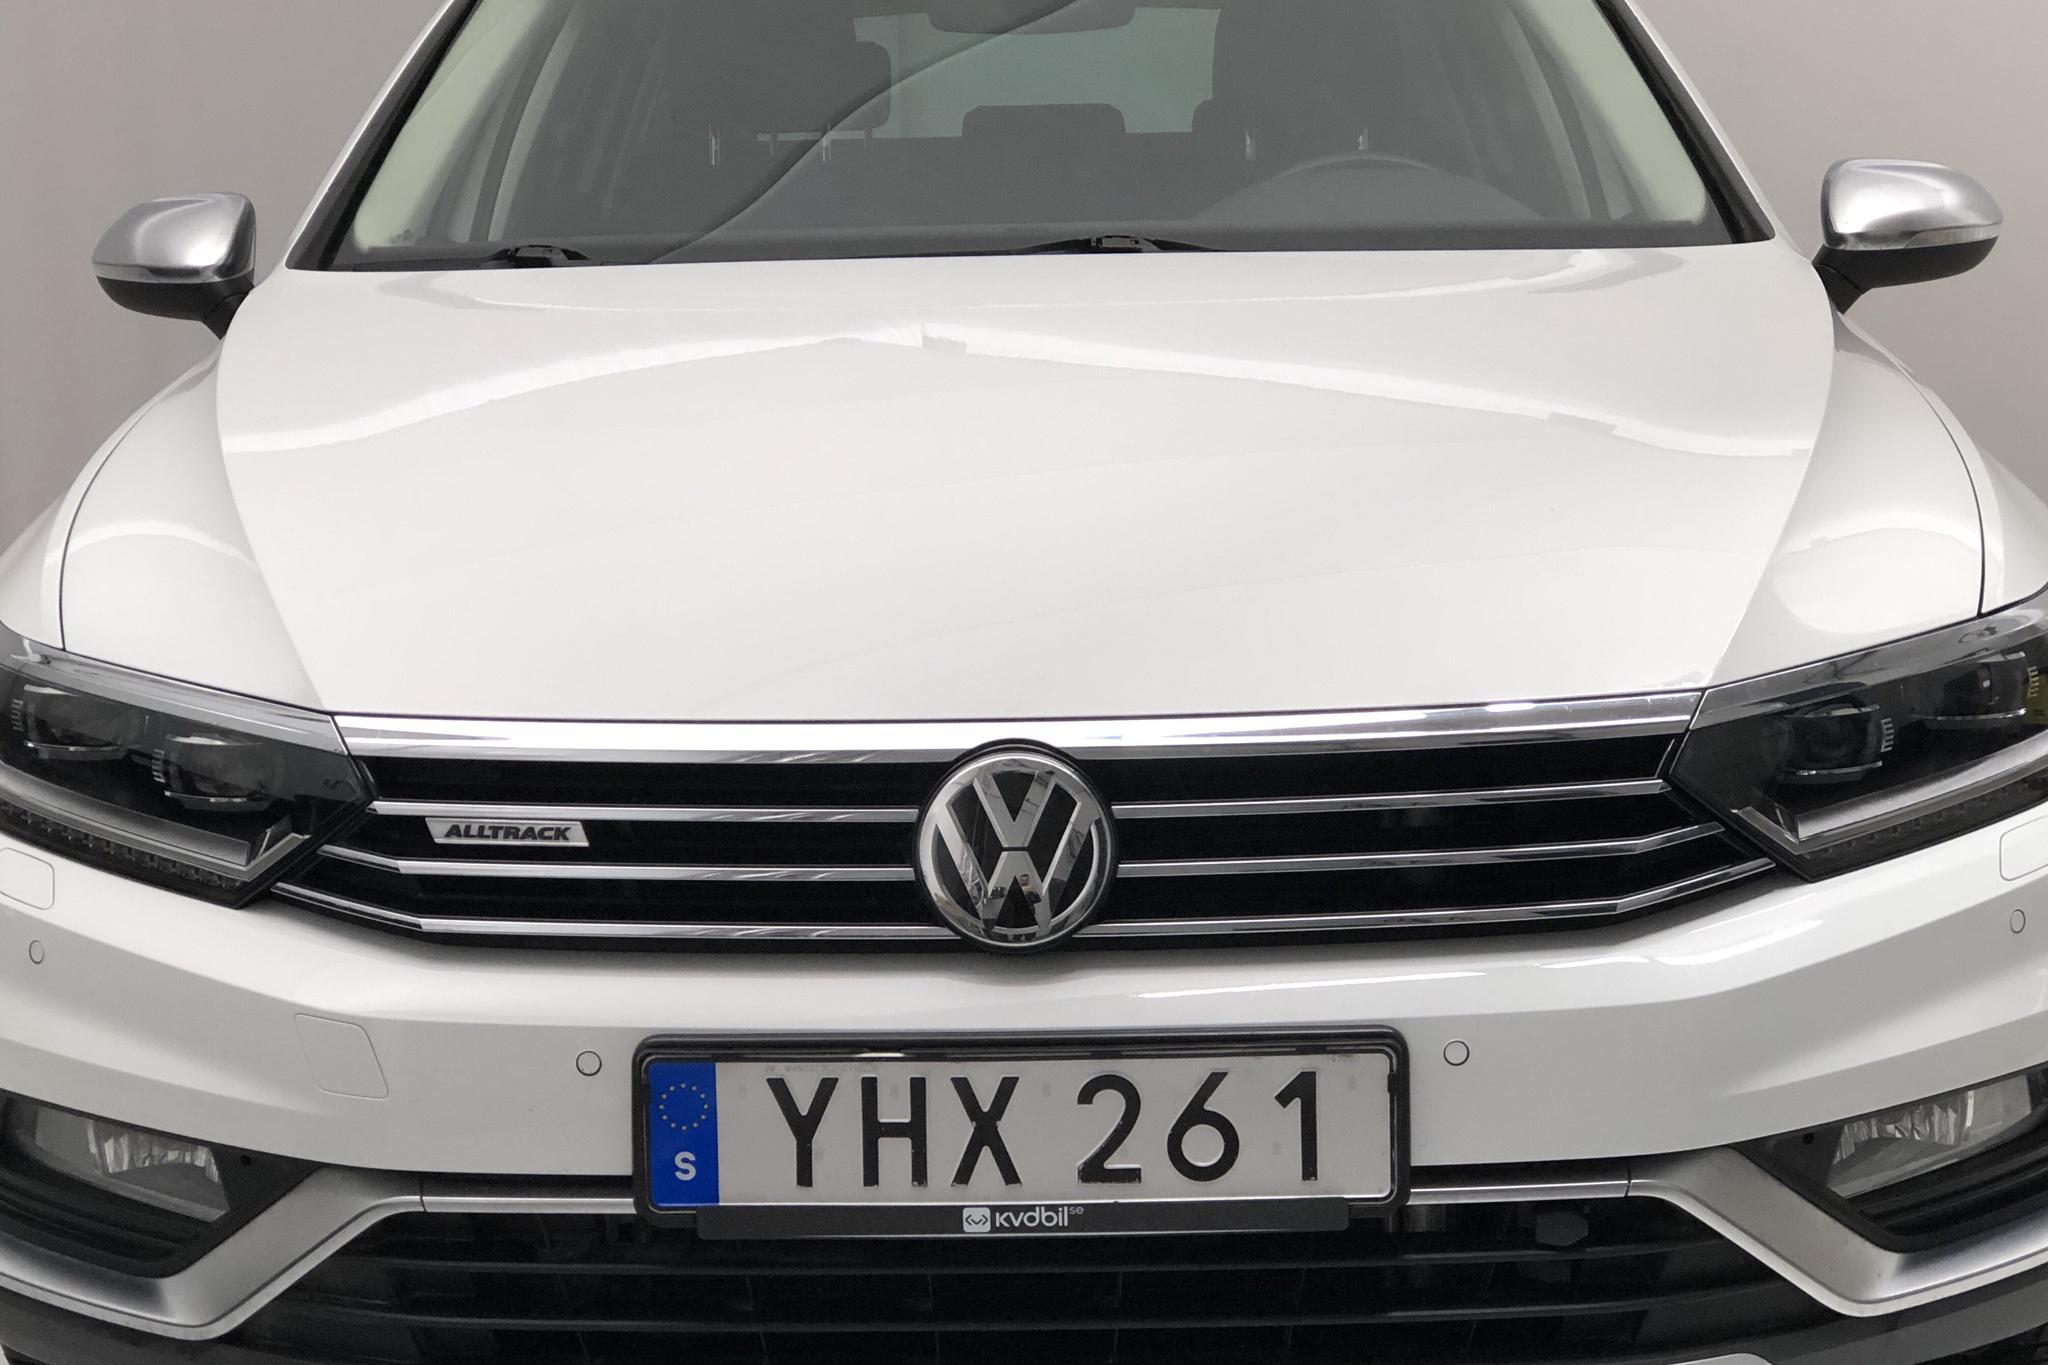 VW Passat Alltrack 2.0 TDI Sportscombi 4MOTION (190hk) - 10 525 mil - Automat - vit - 2017